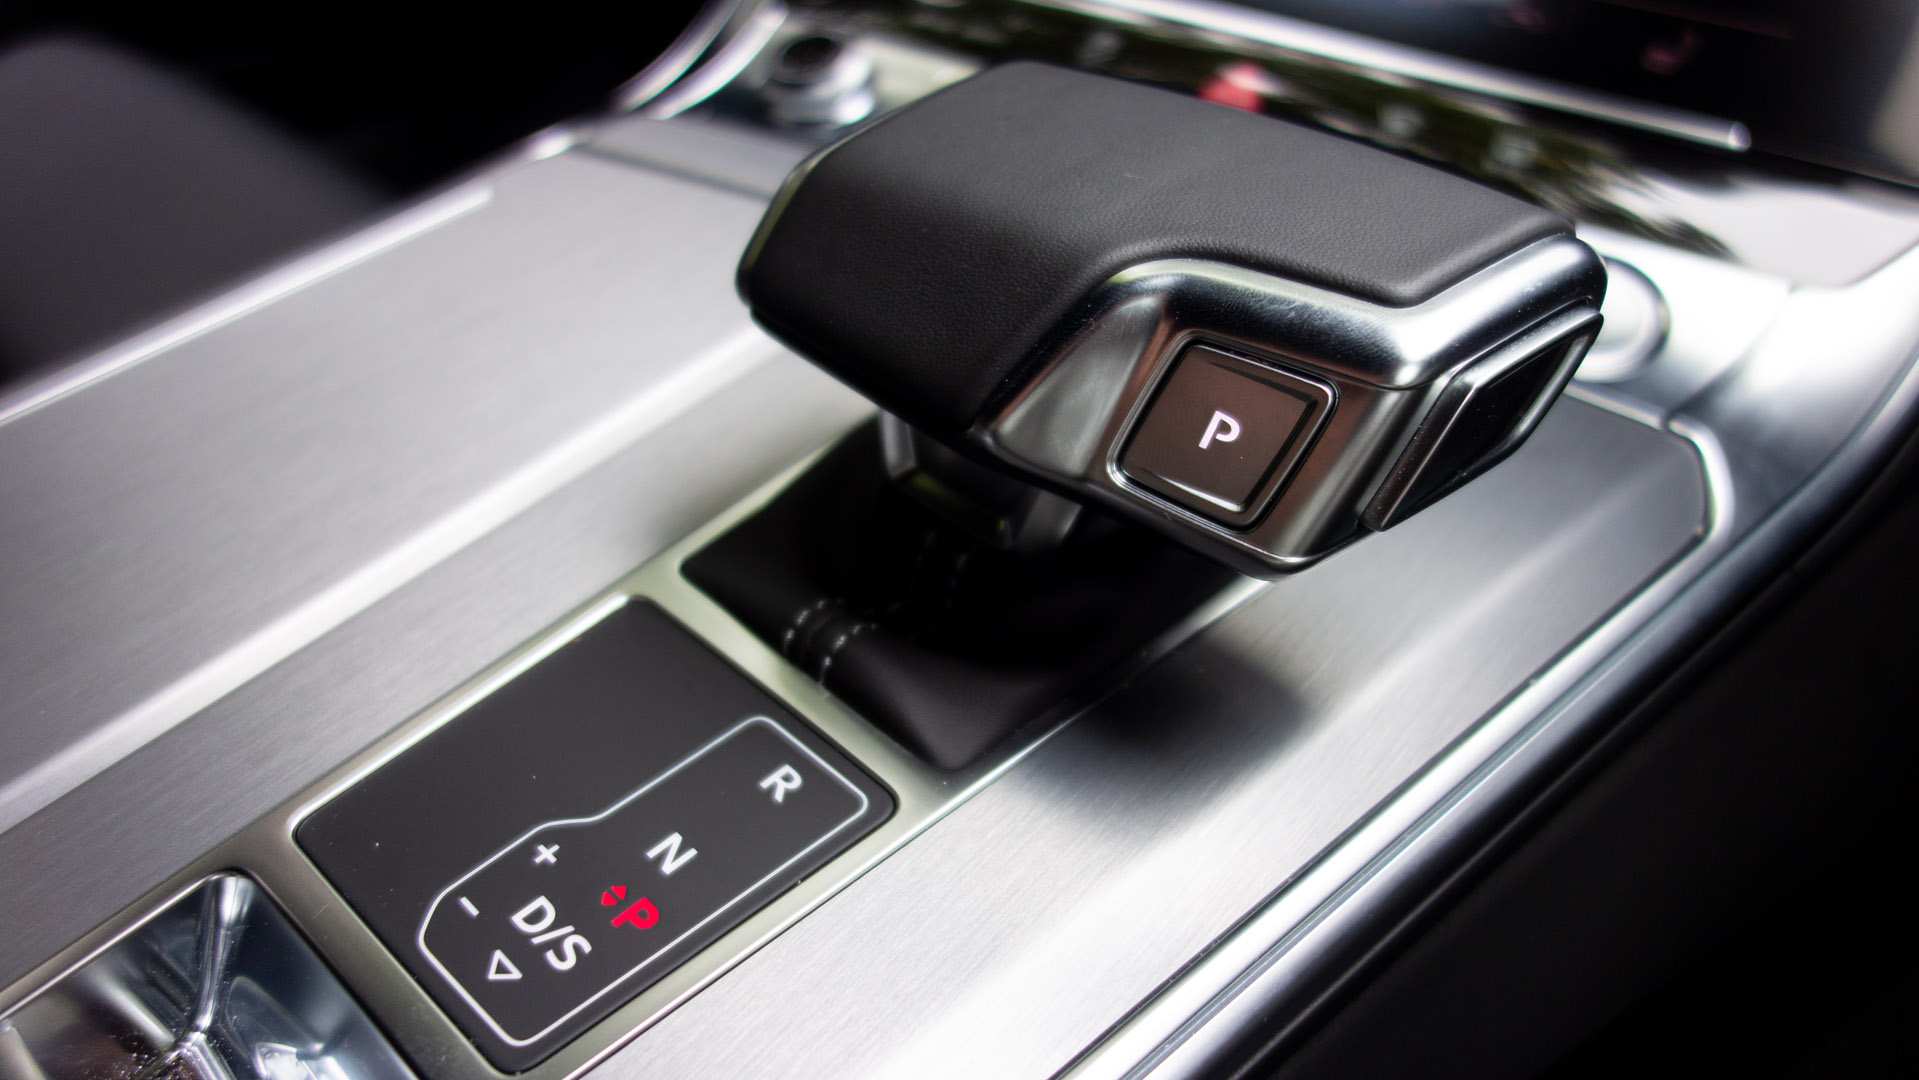 Audi A7 TFSIe gear selector